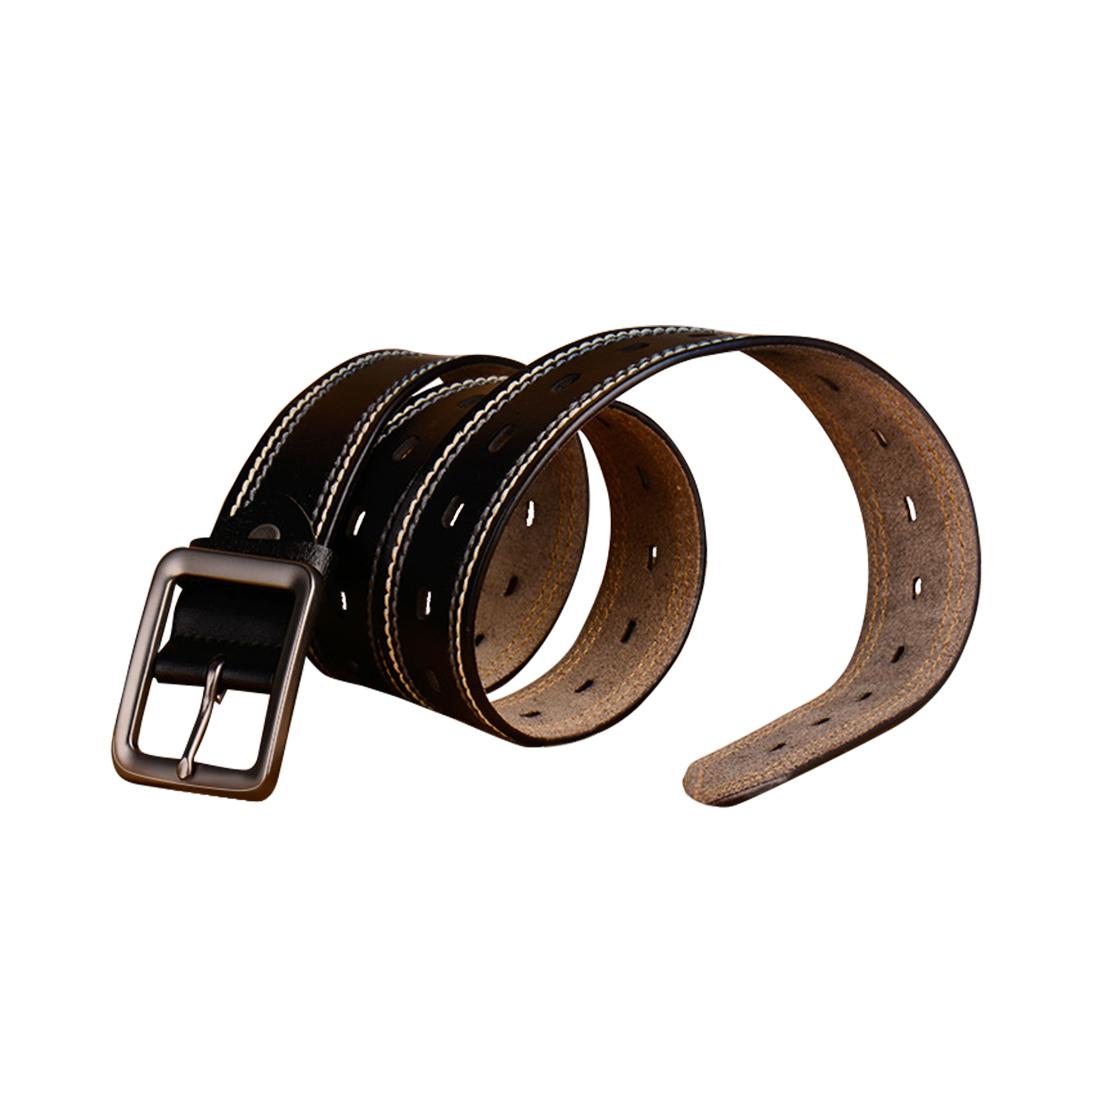 Mens Fancy Stitching Single Pin Buckle Leather Belt 39mm Width 1 1/2 Black 125cm